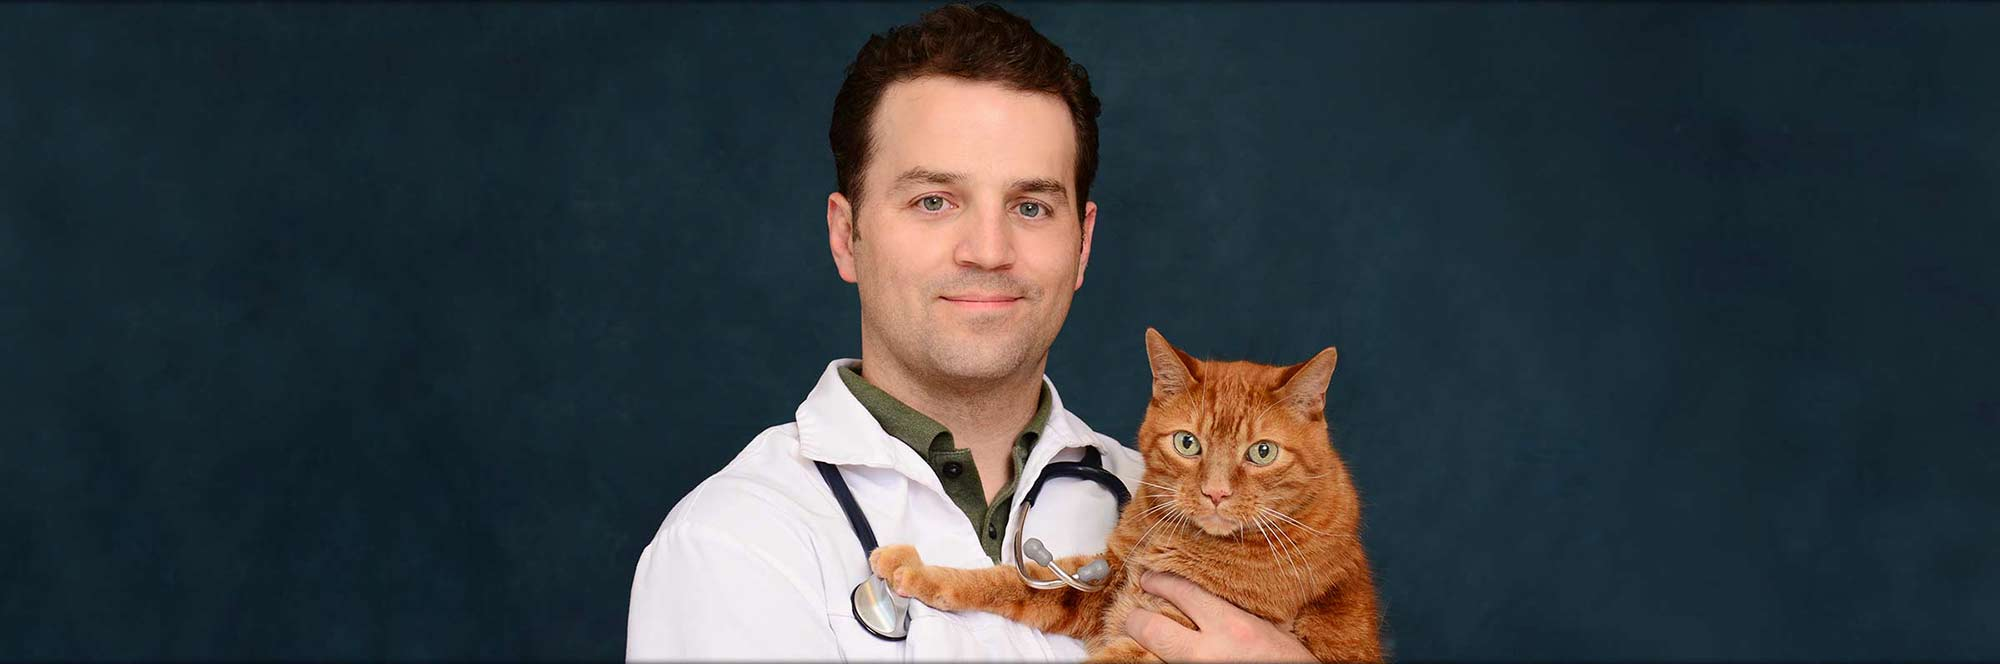 Meet Matthew Kleven, DVM at Greentree Animal Hospital